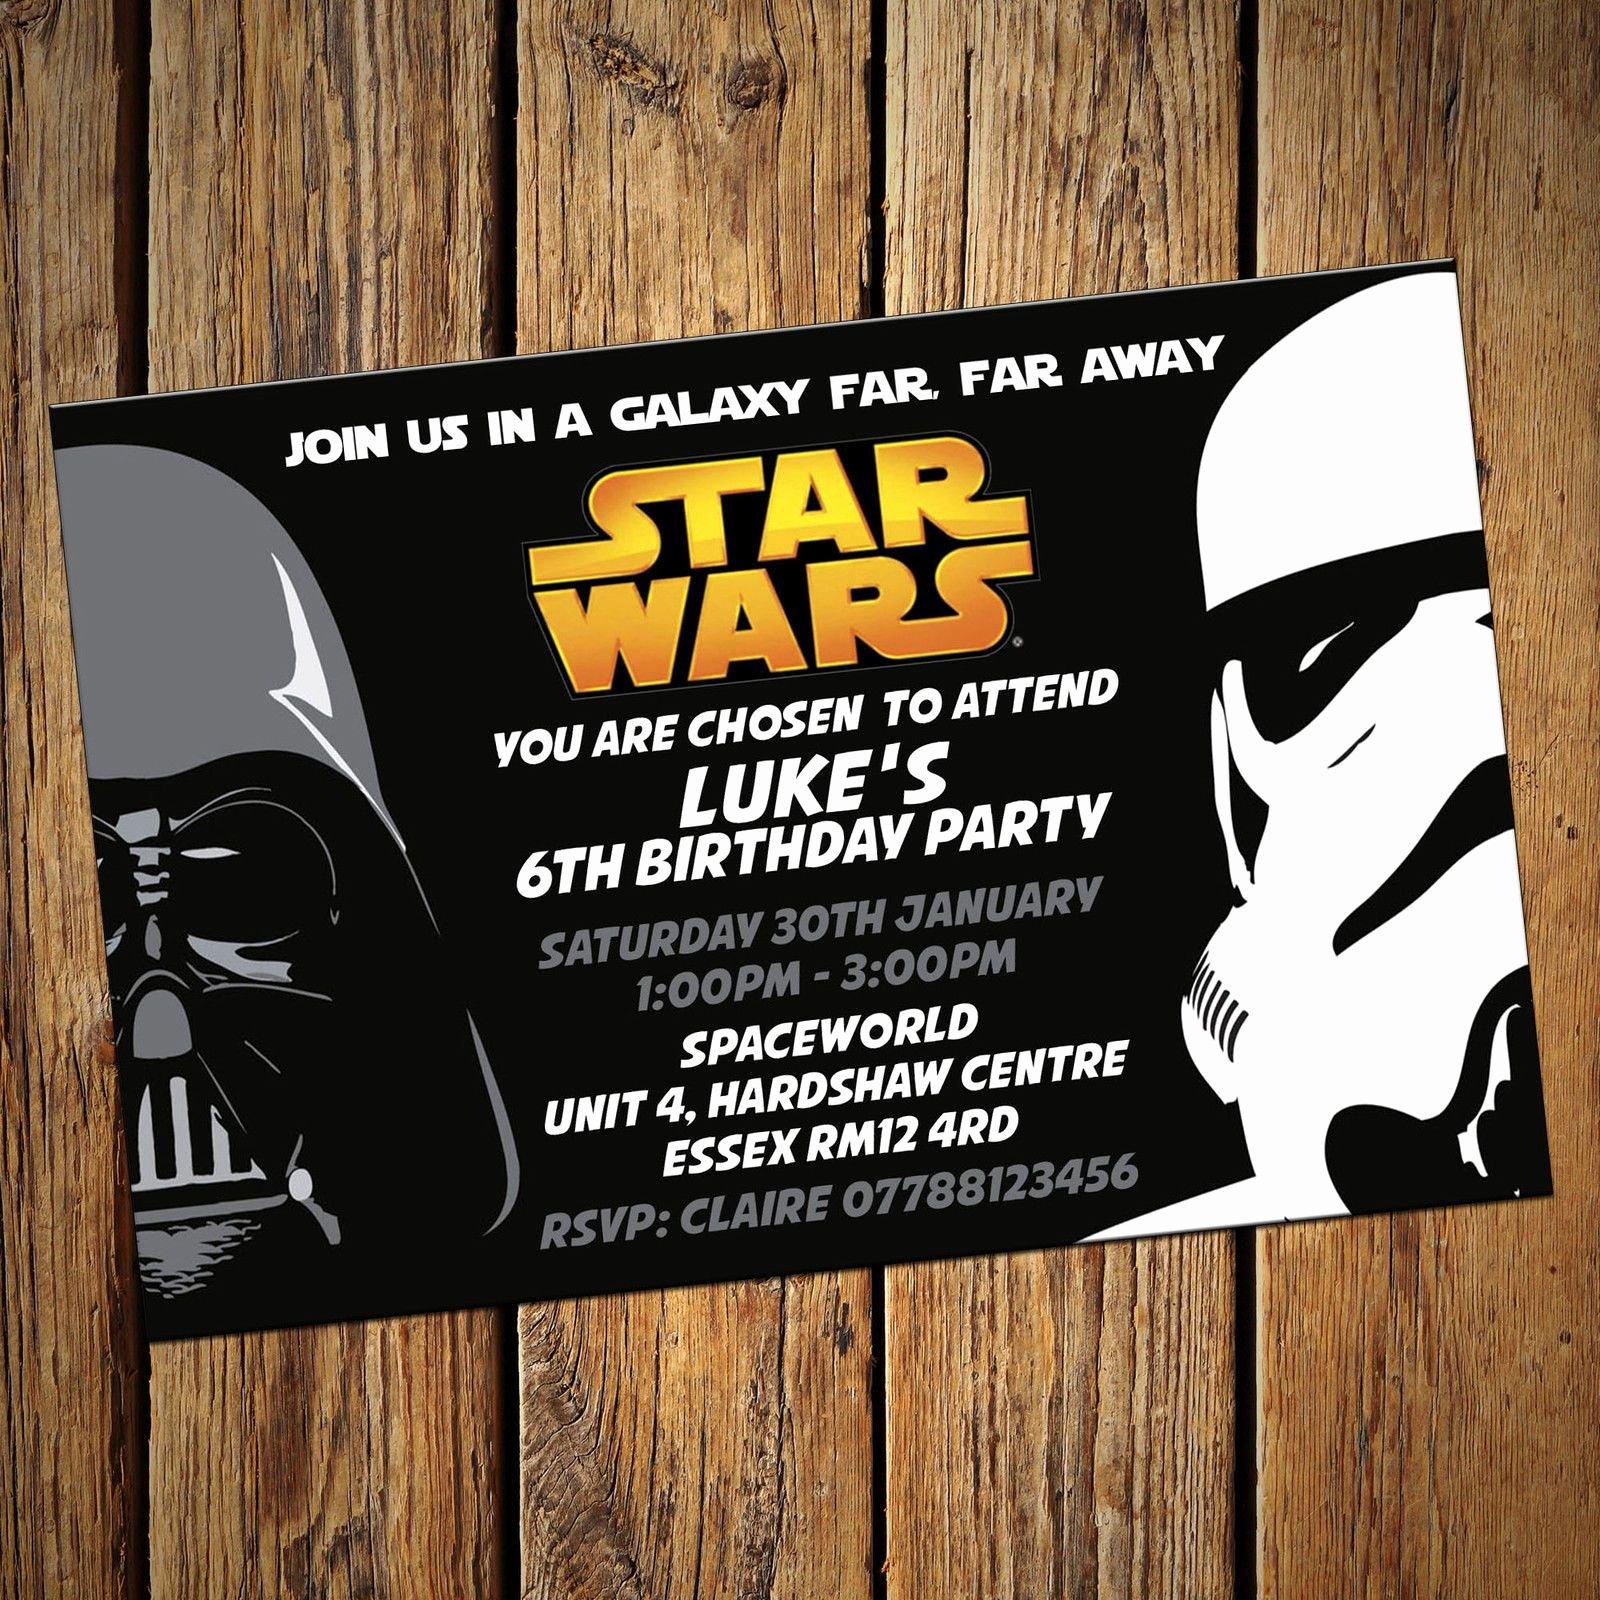 Star Wars Invitations Wording Luxury Personalised Star Wars Invitations Party Invites